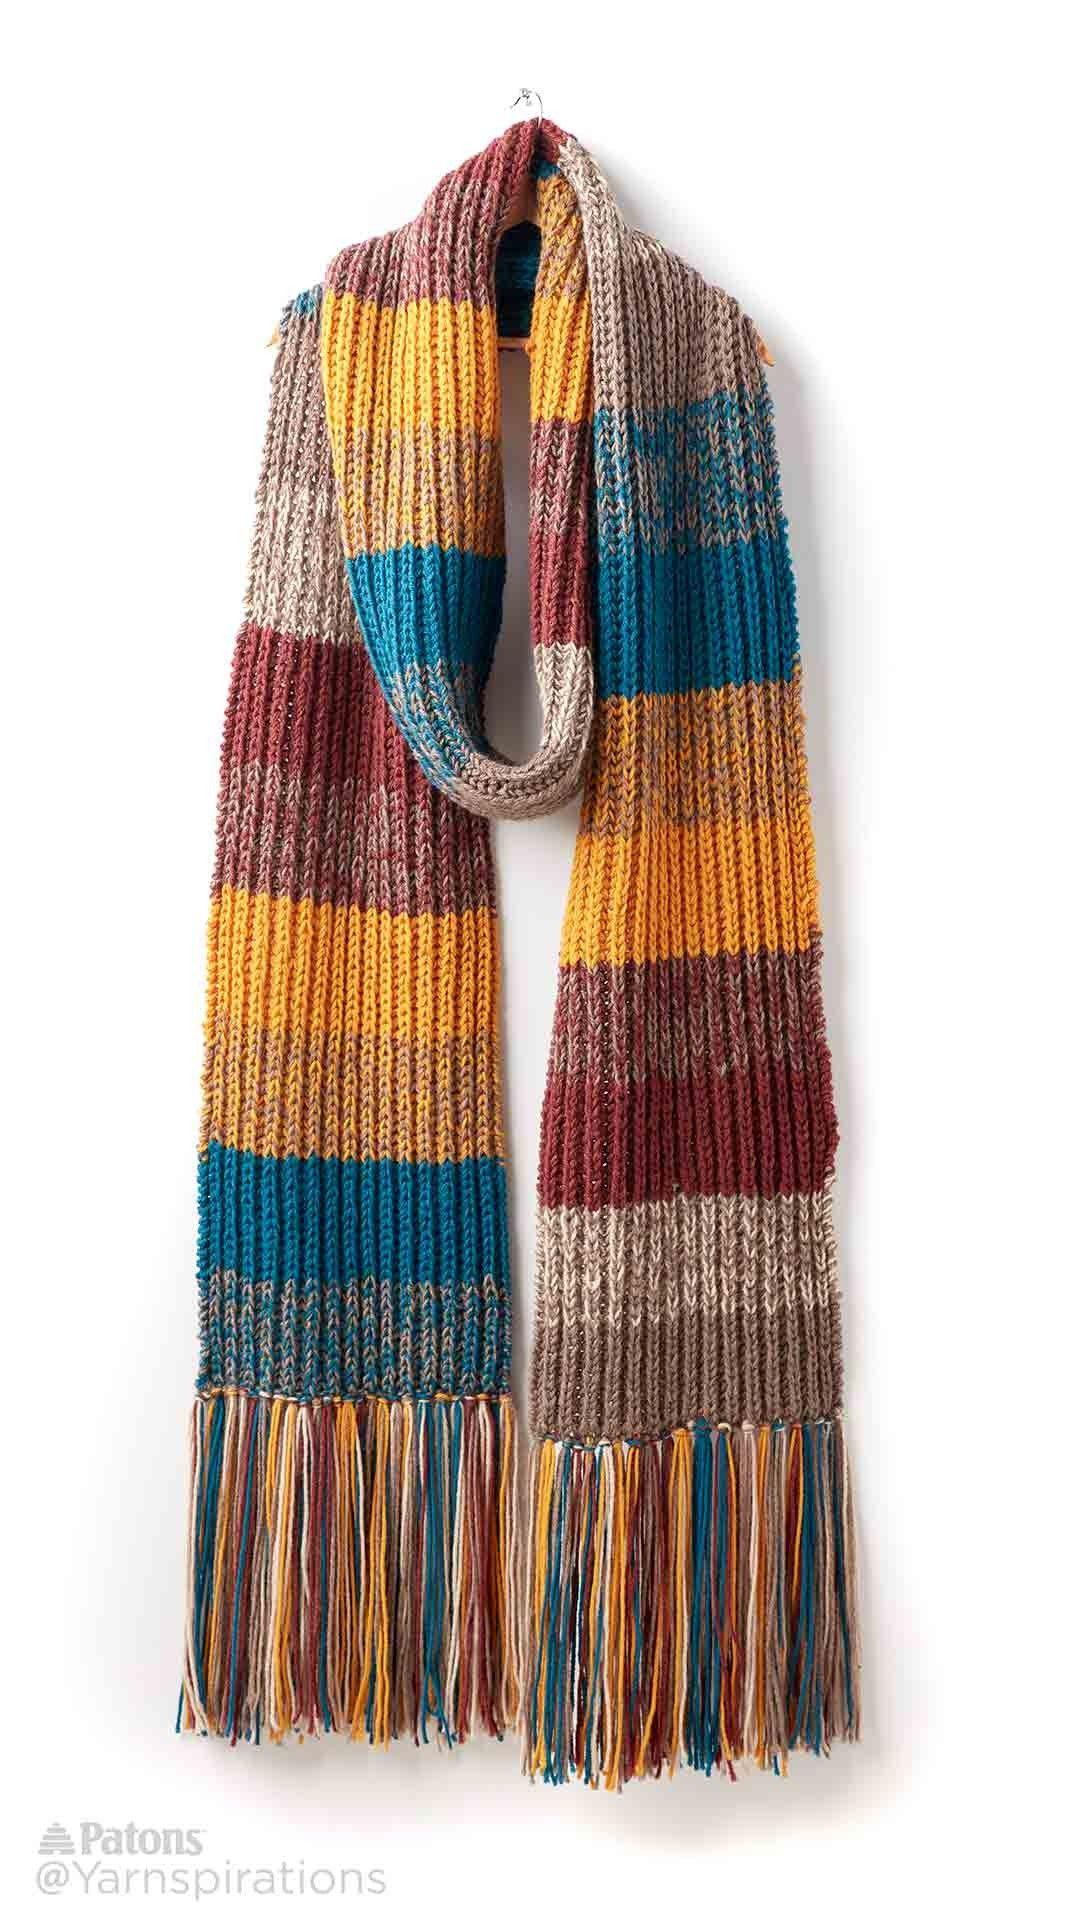 Marl Stripe Knit Super Scarf - Patterns | Yarnspirations | Crochet ...